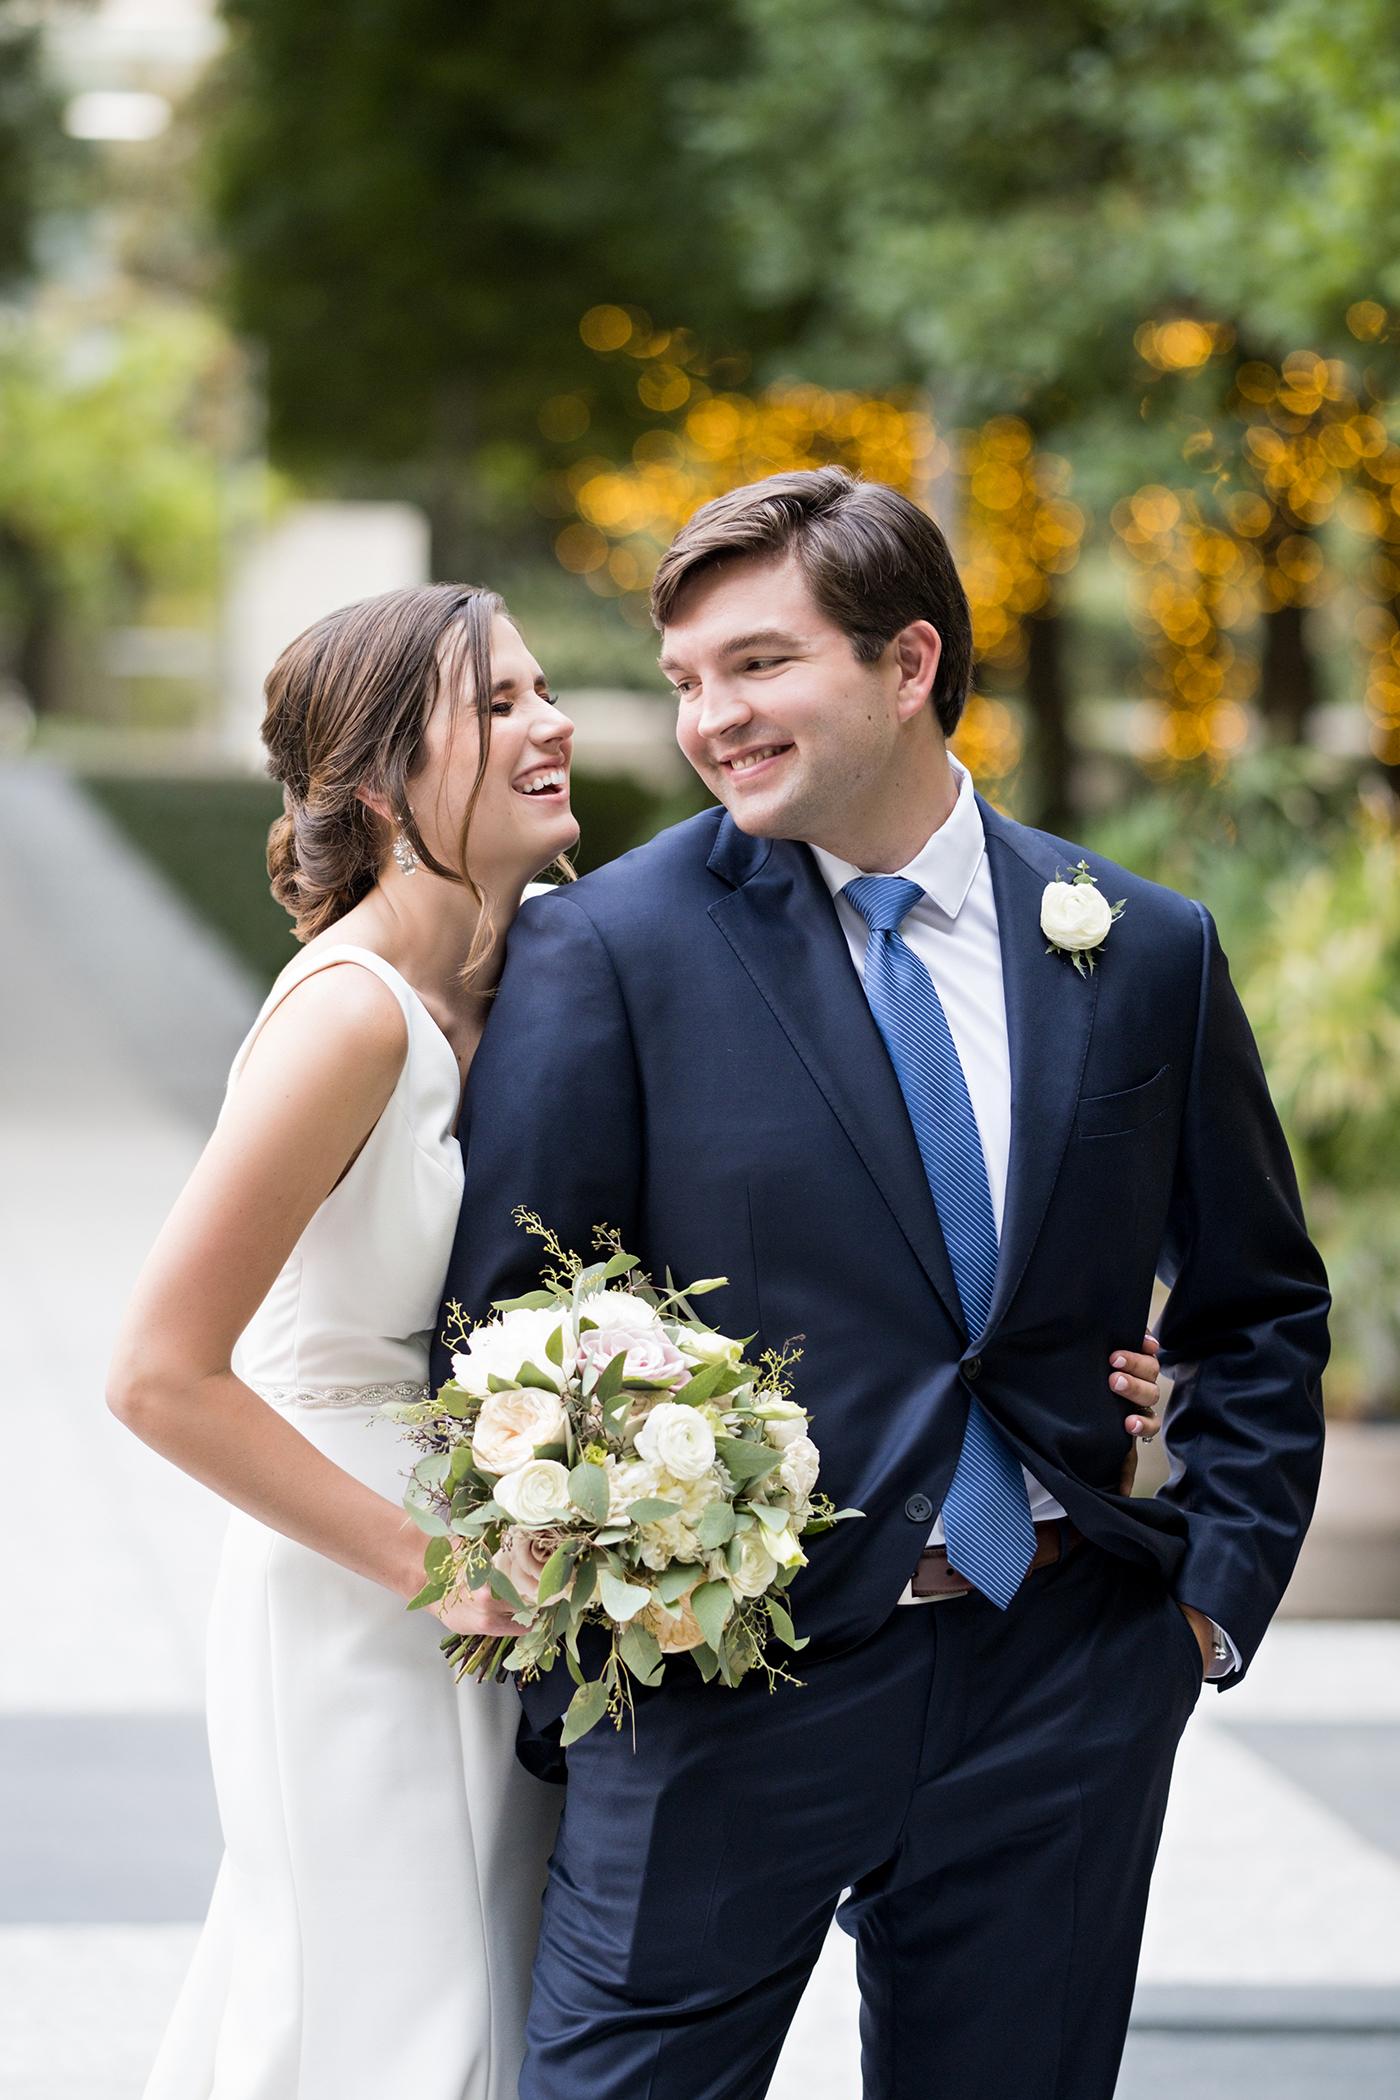 Wedding Planner Dallas TX - Allday Events - Highland Park - Marie Gabrielle Wedding - 289.jpg